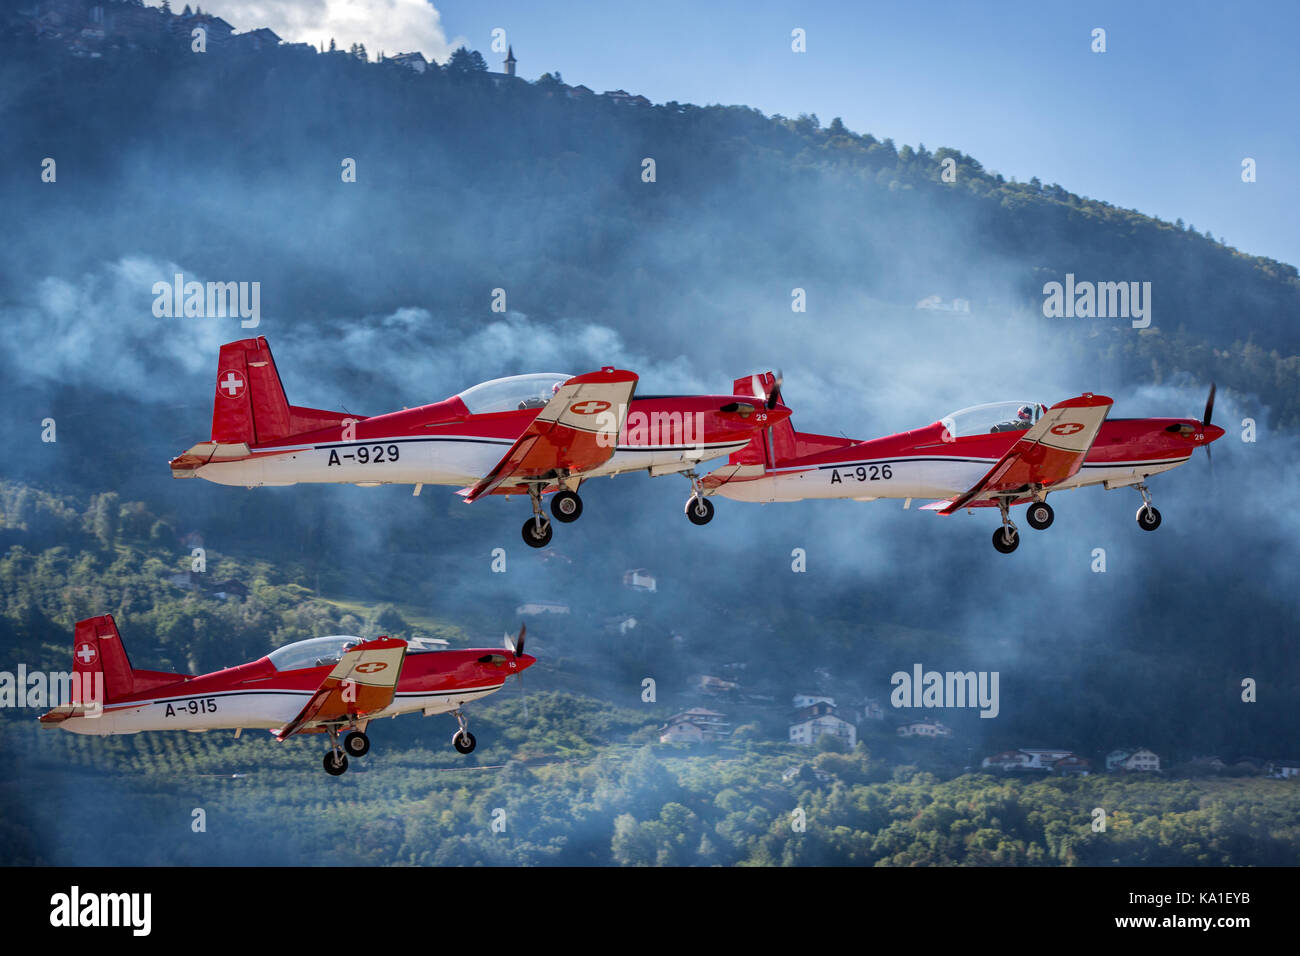 PC 7 Team, Pilatus PC-7, Sion Airshow, Sion, Valais, Switzerland - Stock Image